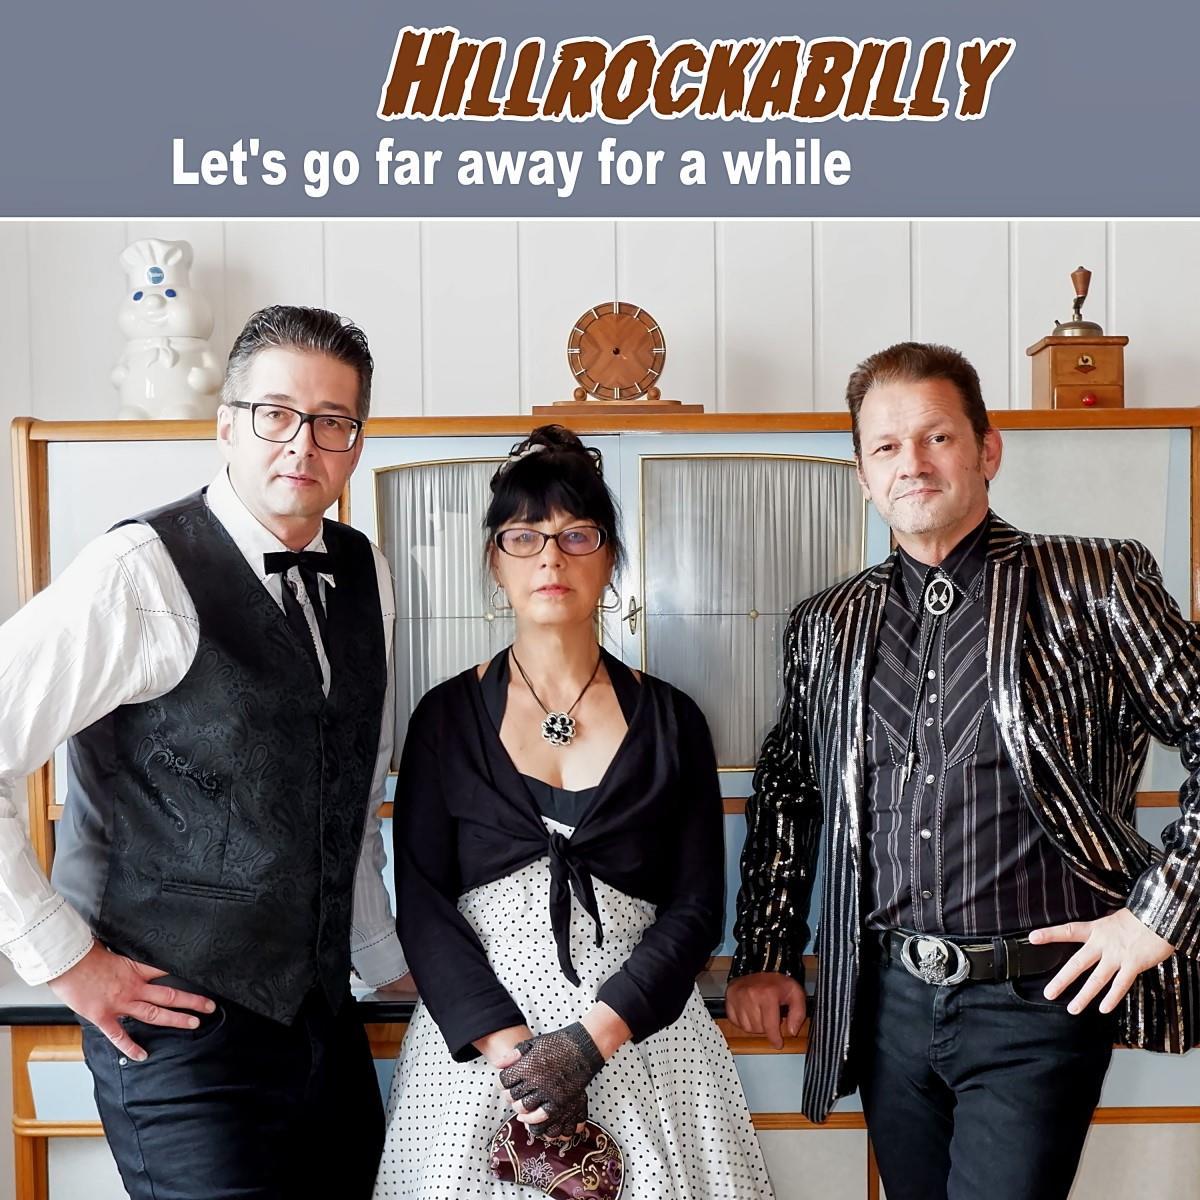 Hillrockabilly